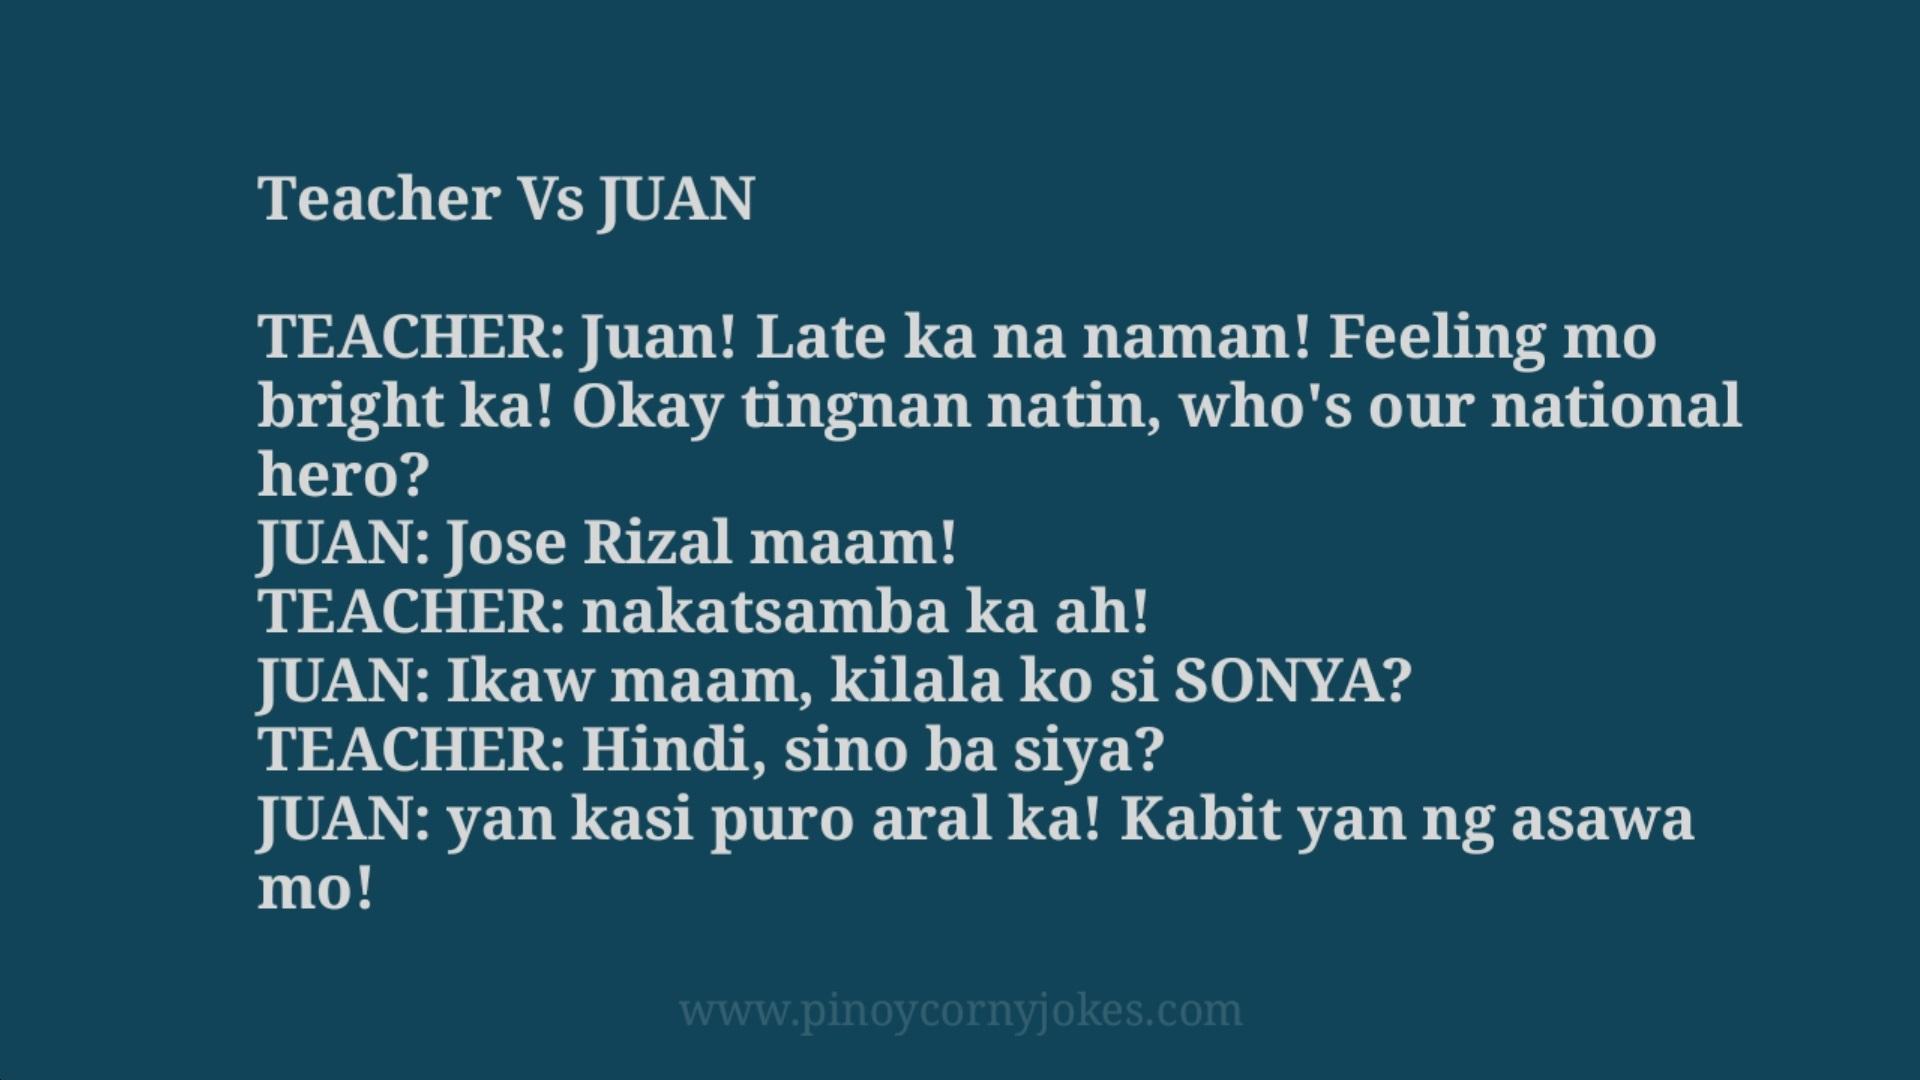 juan late pinoy school jokes 2021